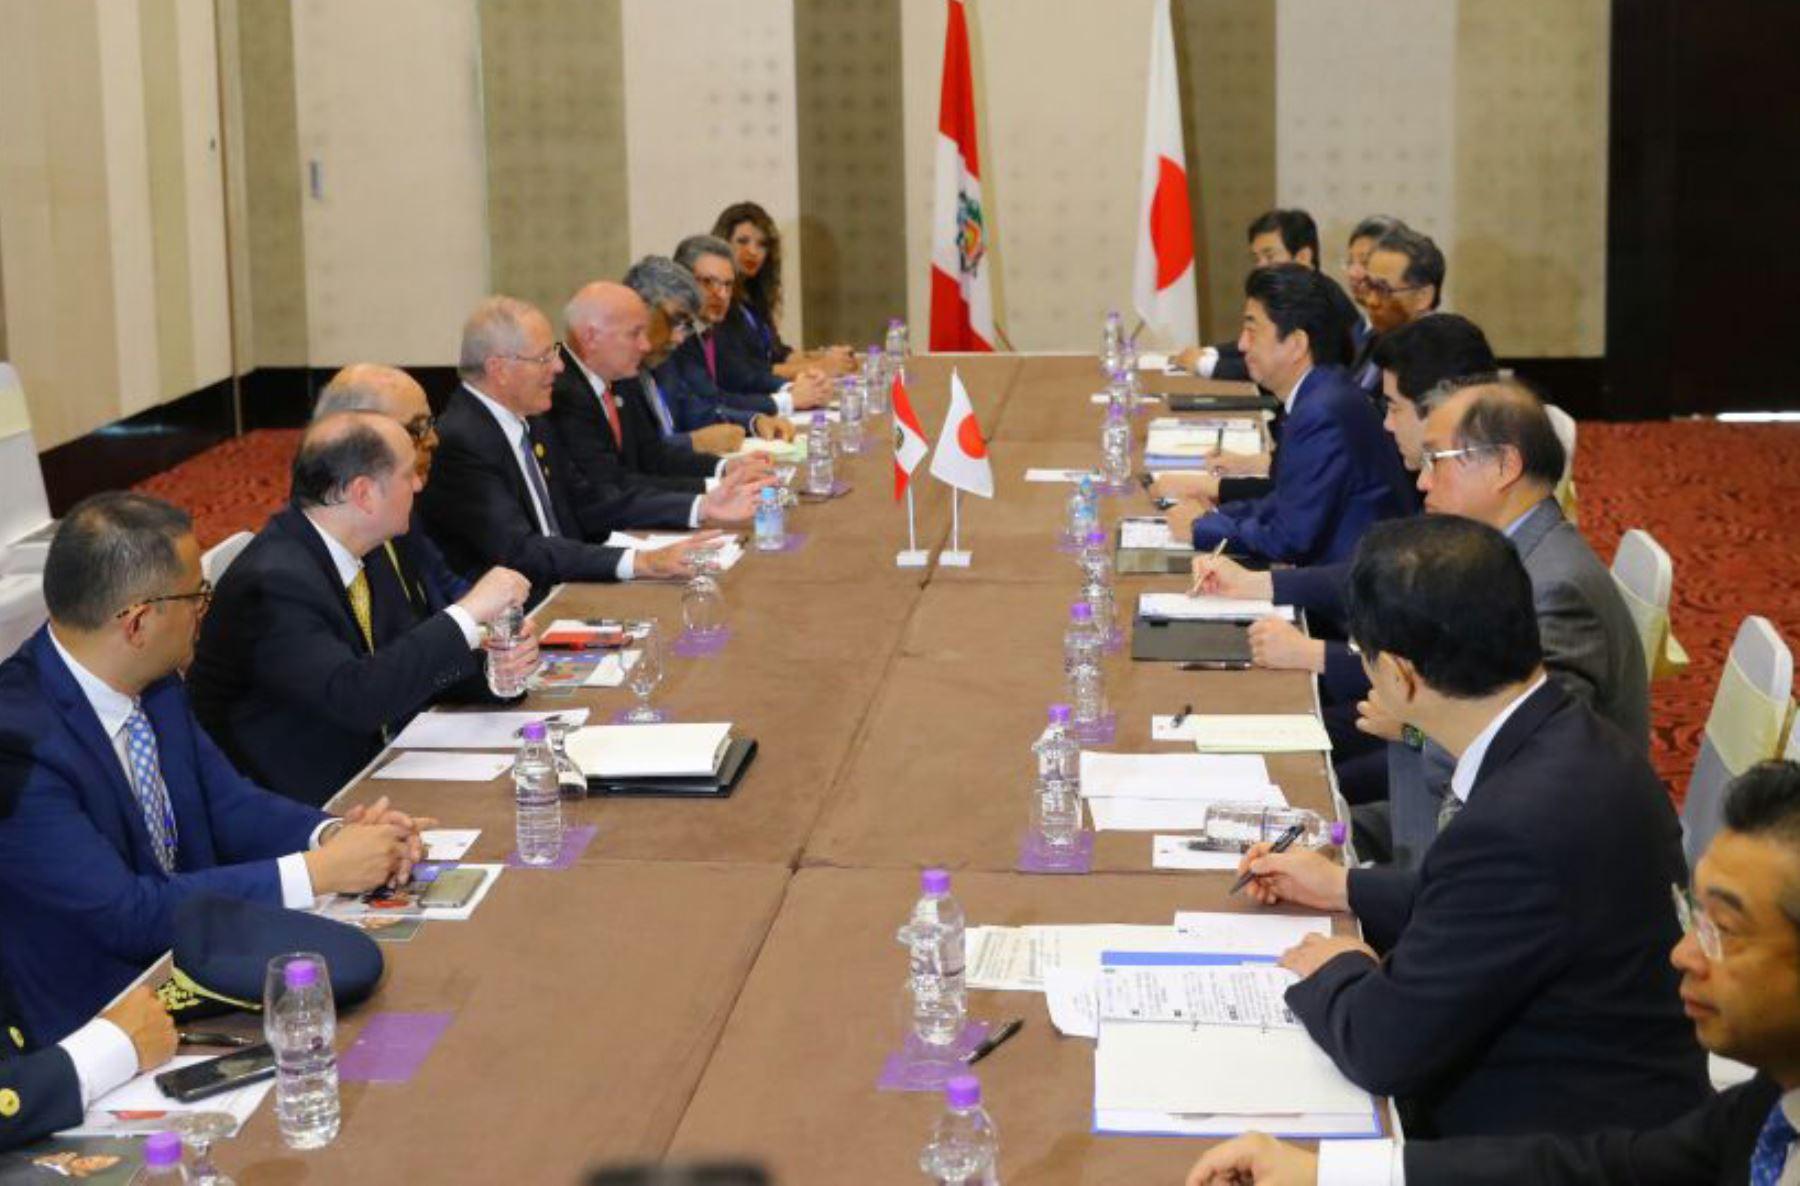 Presidente Kuczynski y primer ministro japonés, Shinzō Abe sostuvieron encuentro bilateral en APEC 2017.Foto:ANDINA/Presidencia